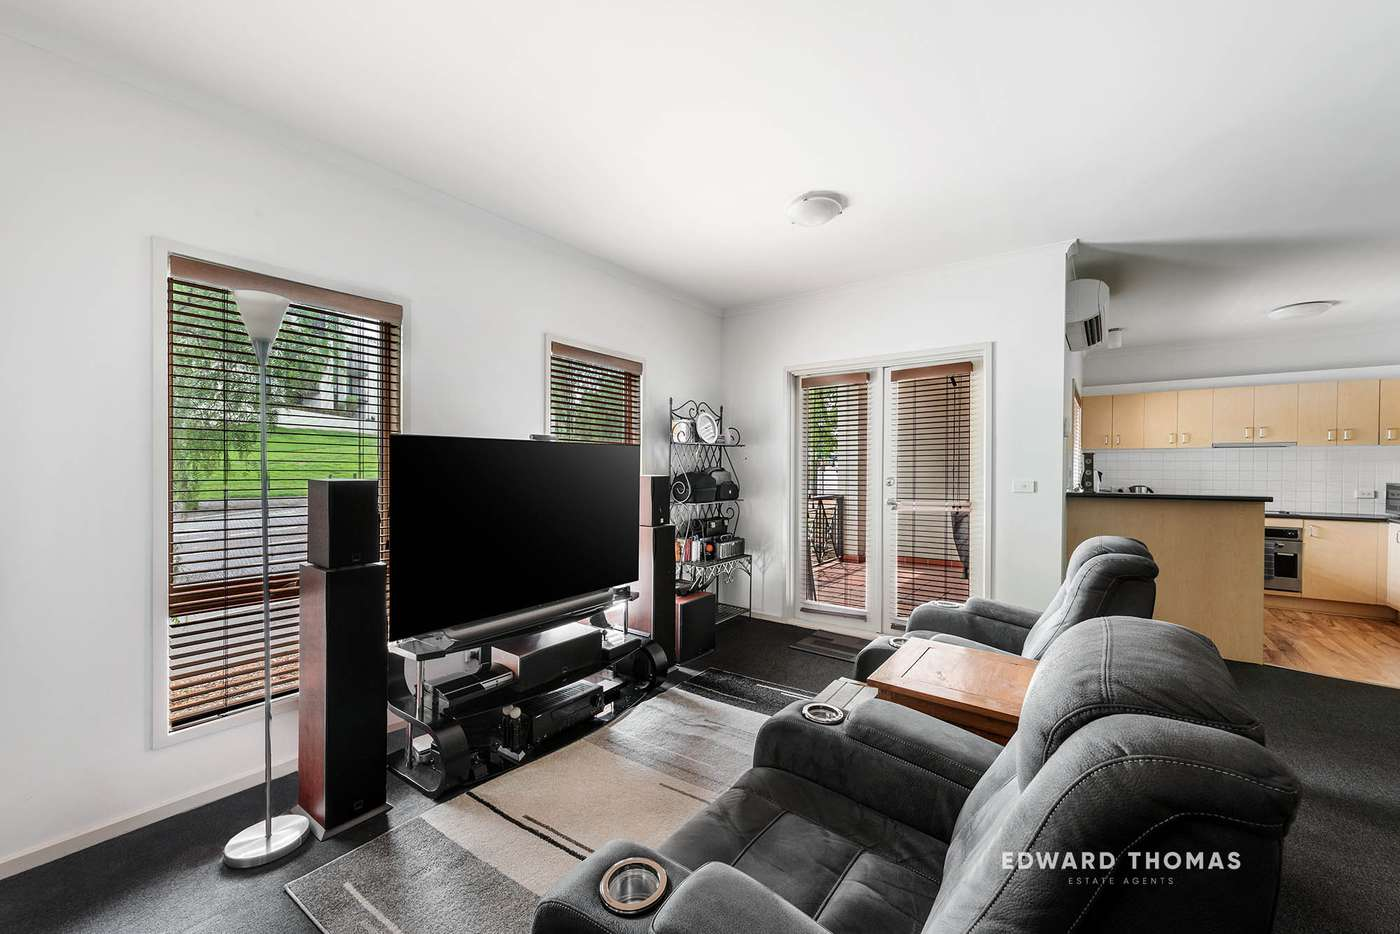 Main view of Homely apartment listing, 42/8-32 Howlett Street, Kensington VIC 3031